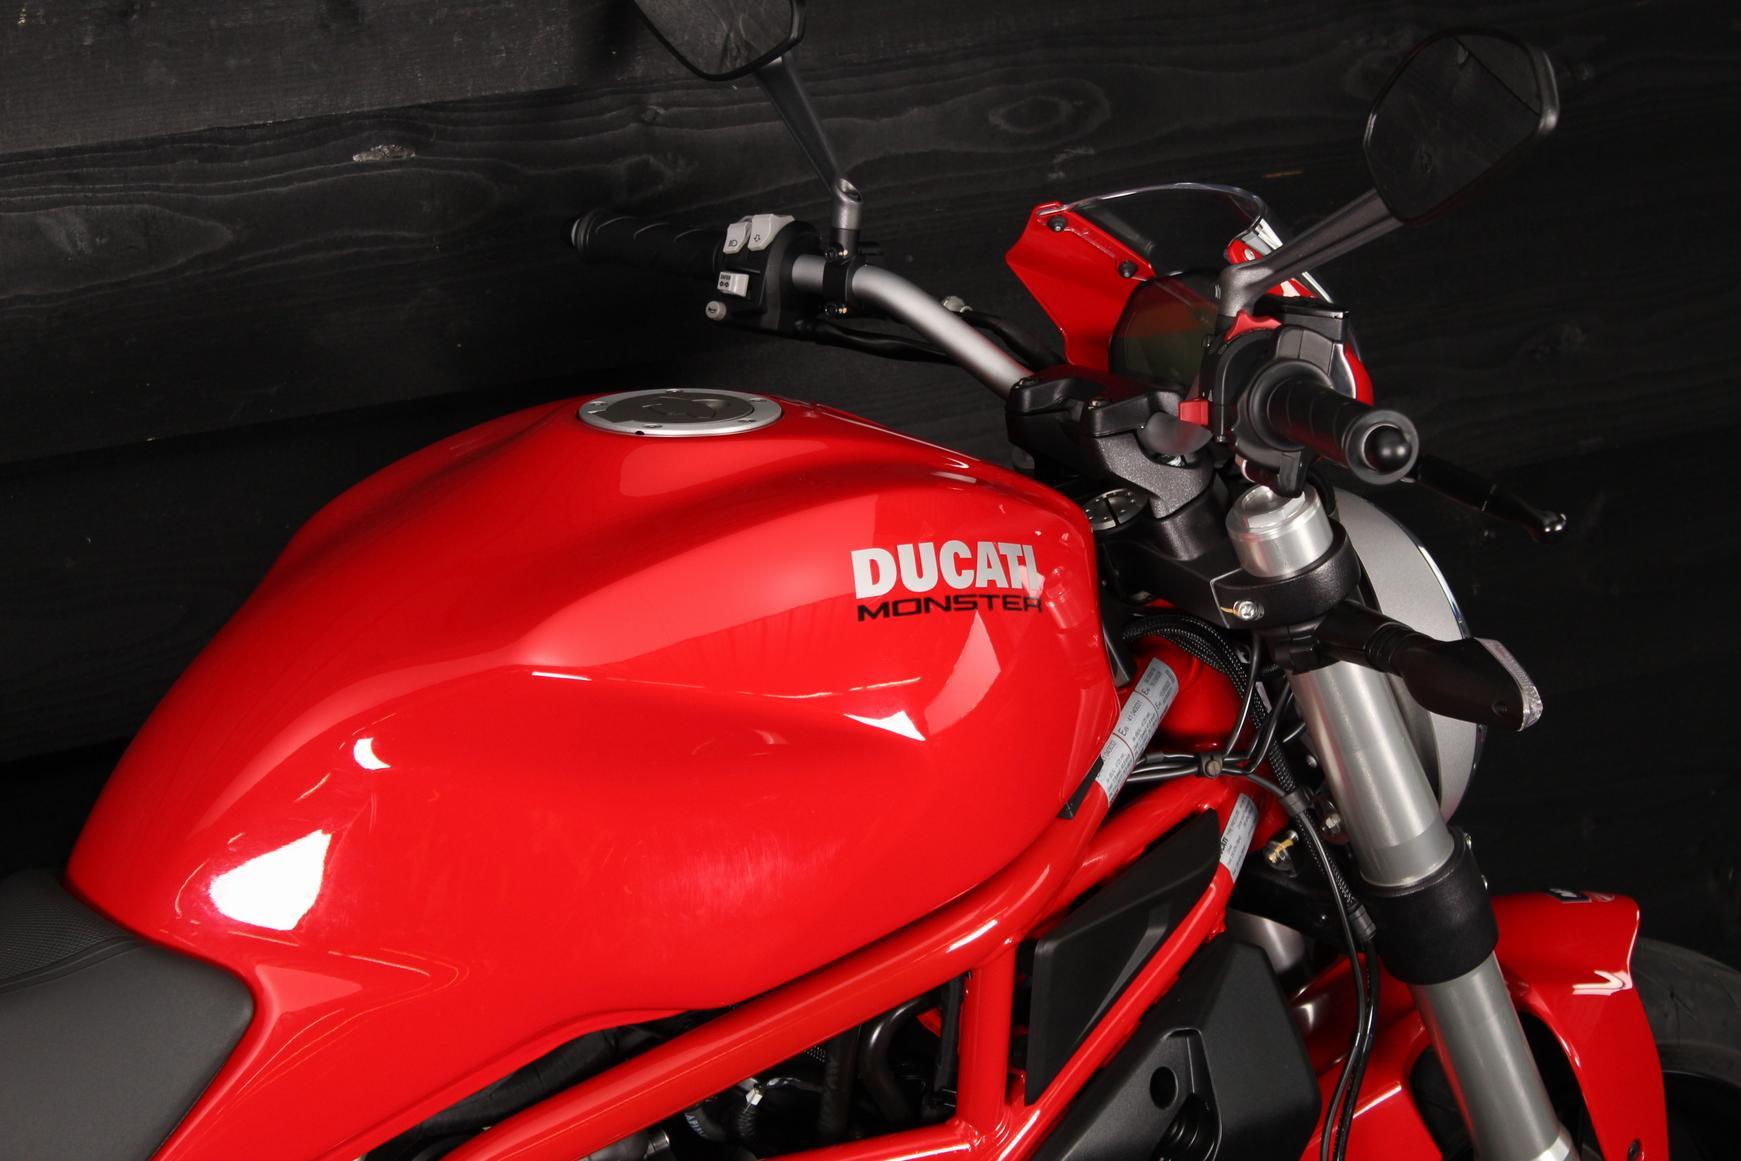 DUCATI - Monster 797 ABS BTW motor 35